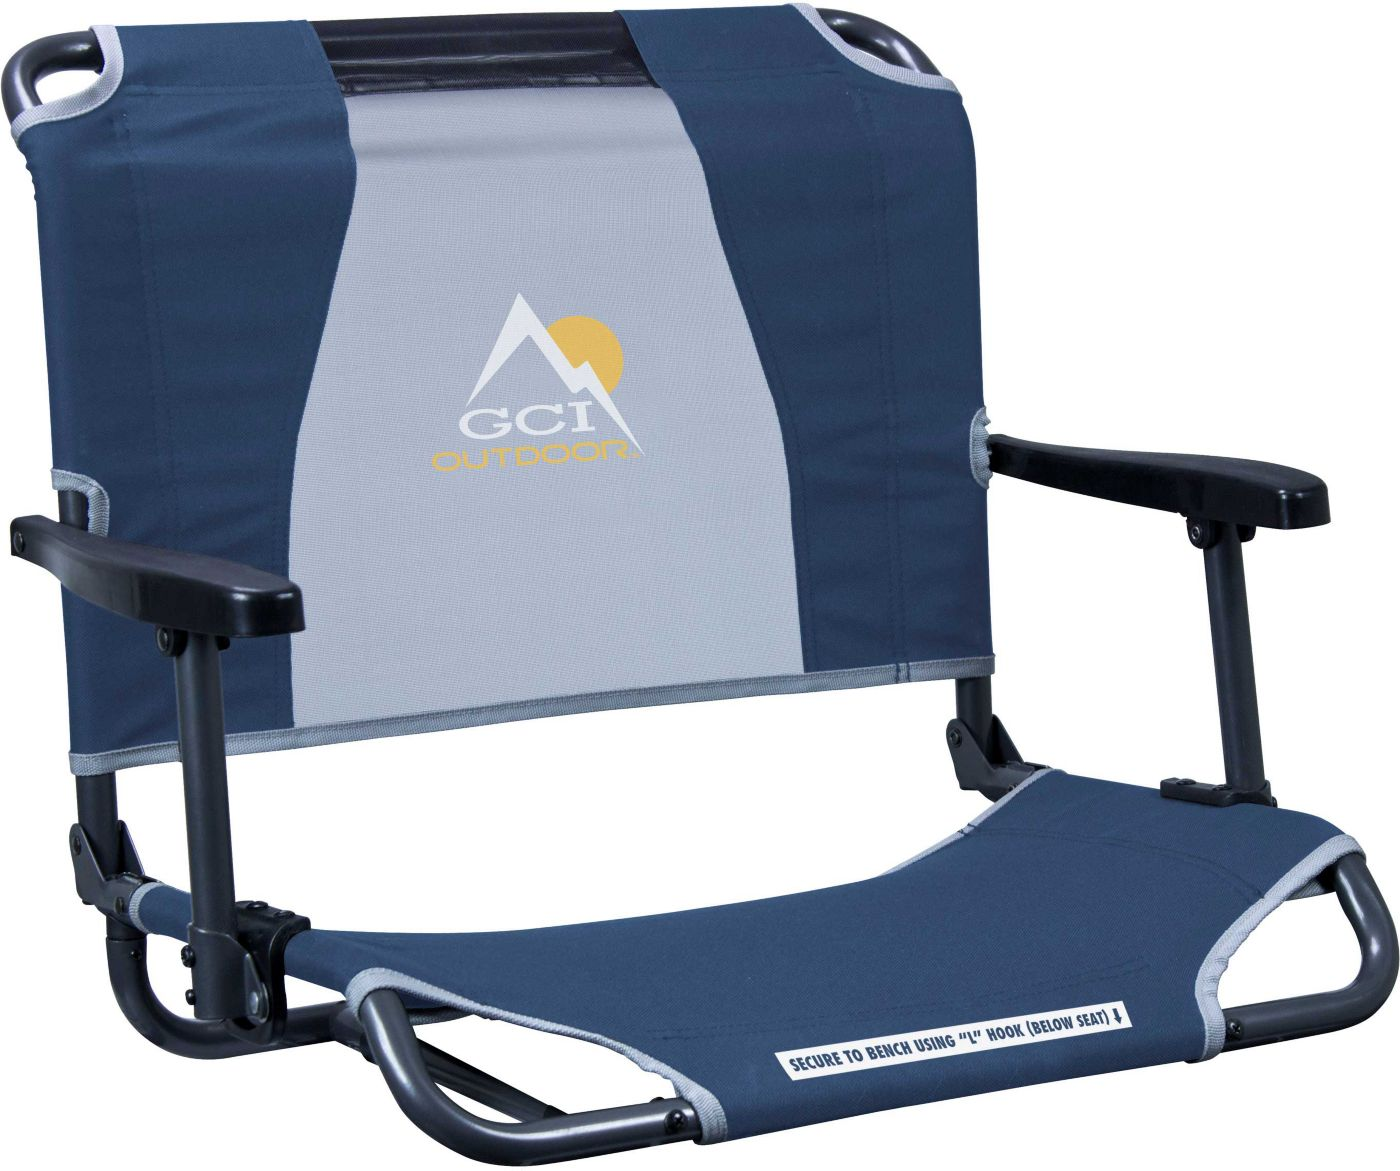 GCI Outdoor Big Comfort Stadium Chair with Armrests